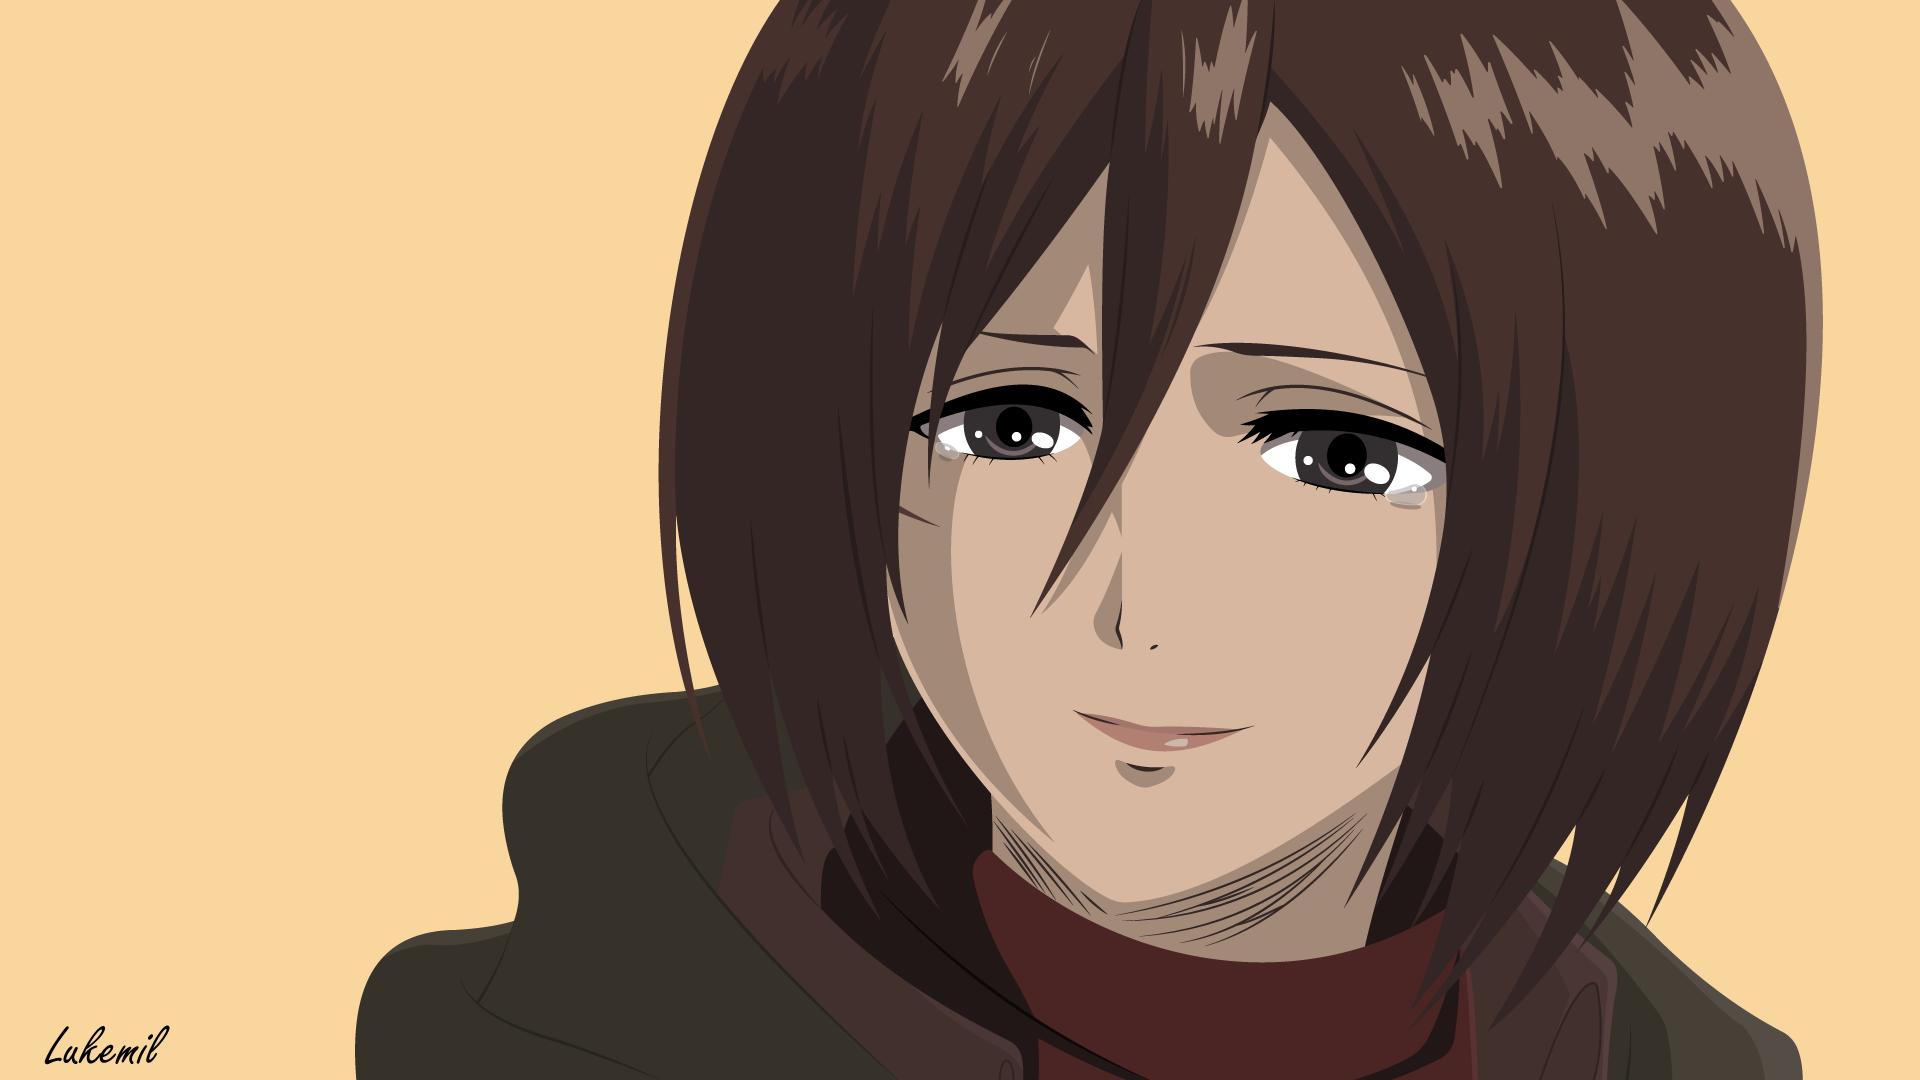 Mikasa Ackerman Shingeki No Kyojin Wallpaper By Lukemil On Deviantart